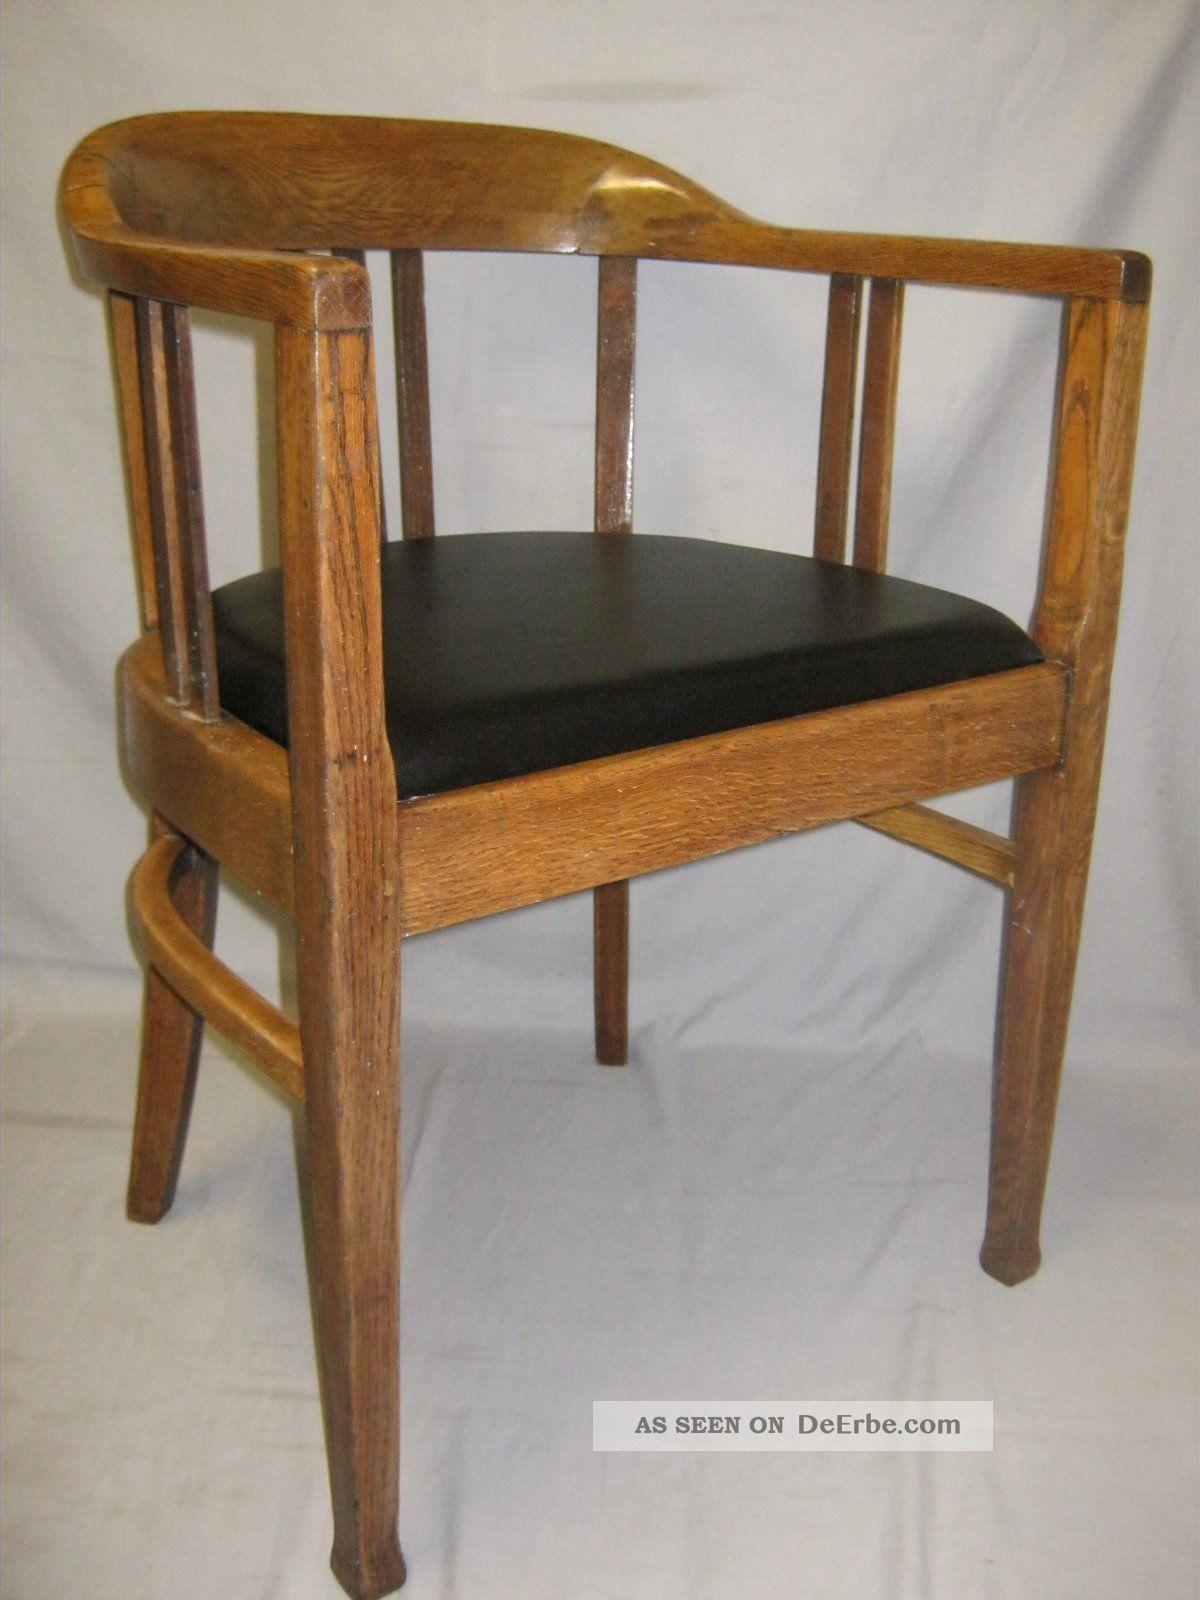 Armlehnstuhl jugendsti art deco gropius stuhl holzstuhl for Armlehnstuhl plastik